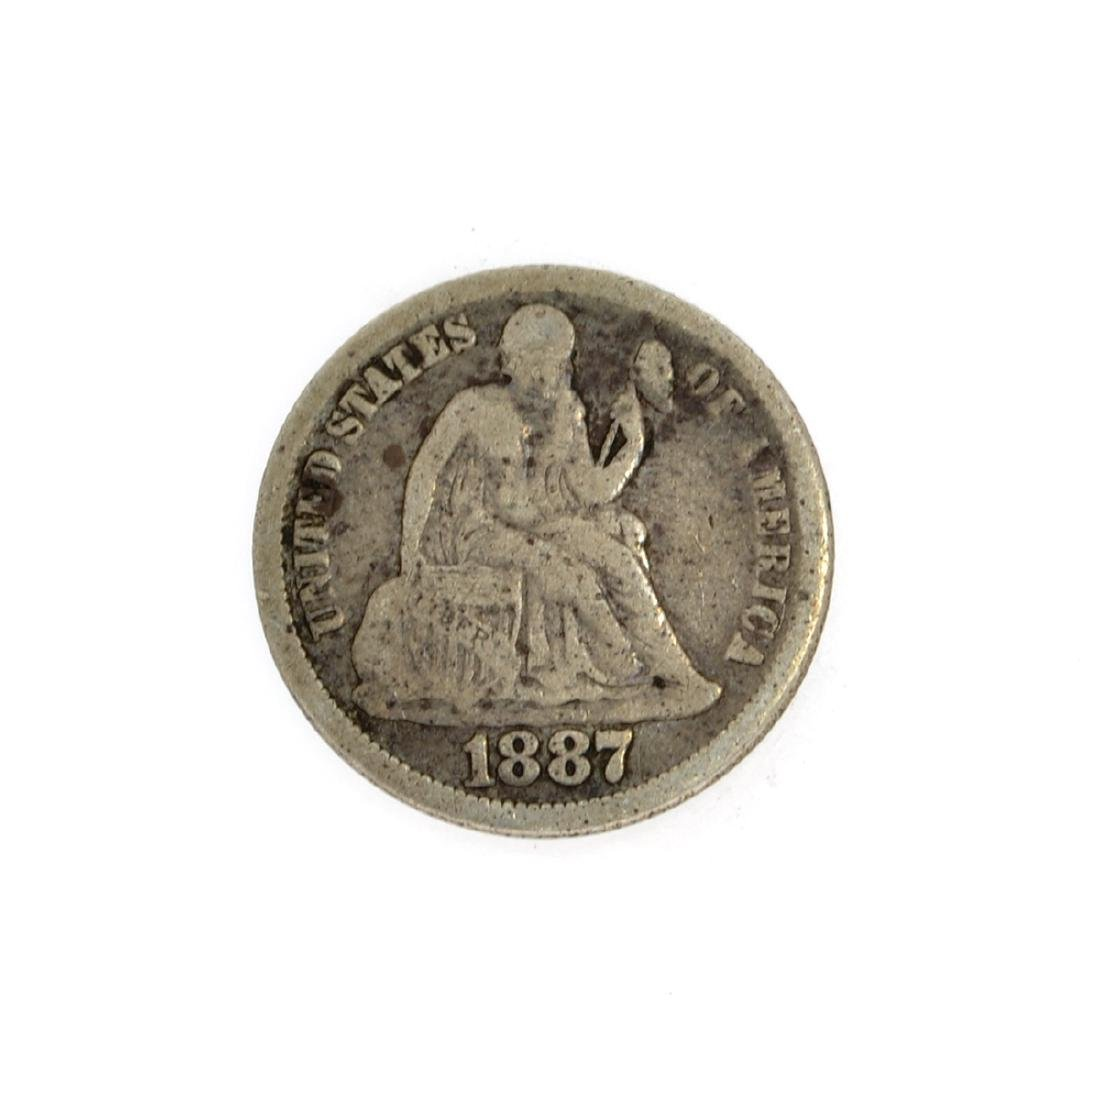 Rare 1887 Liberty Seated Dime Coin